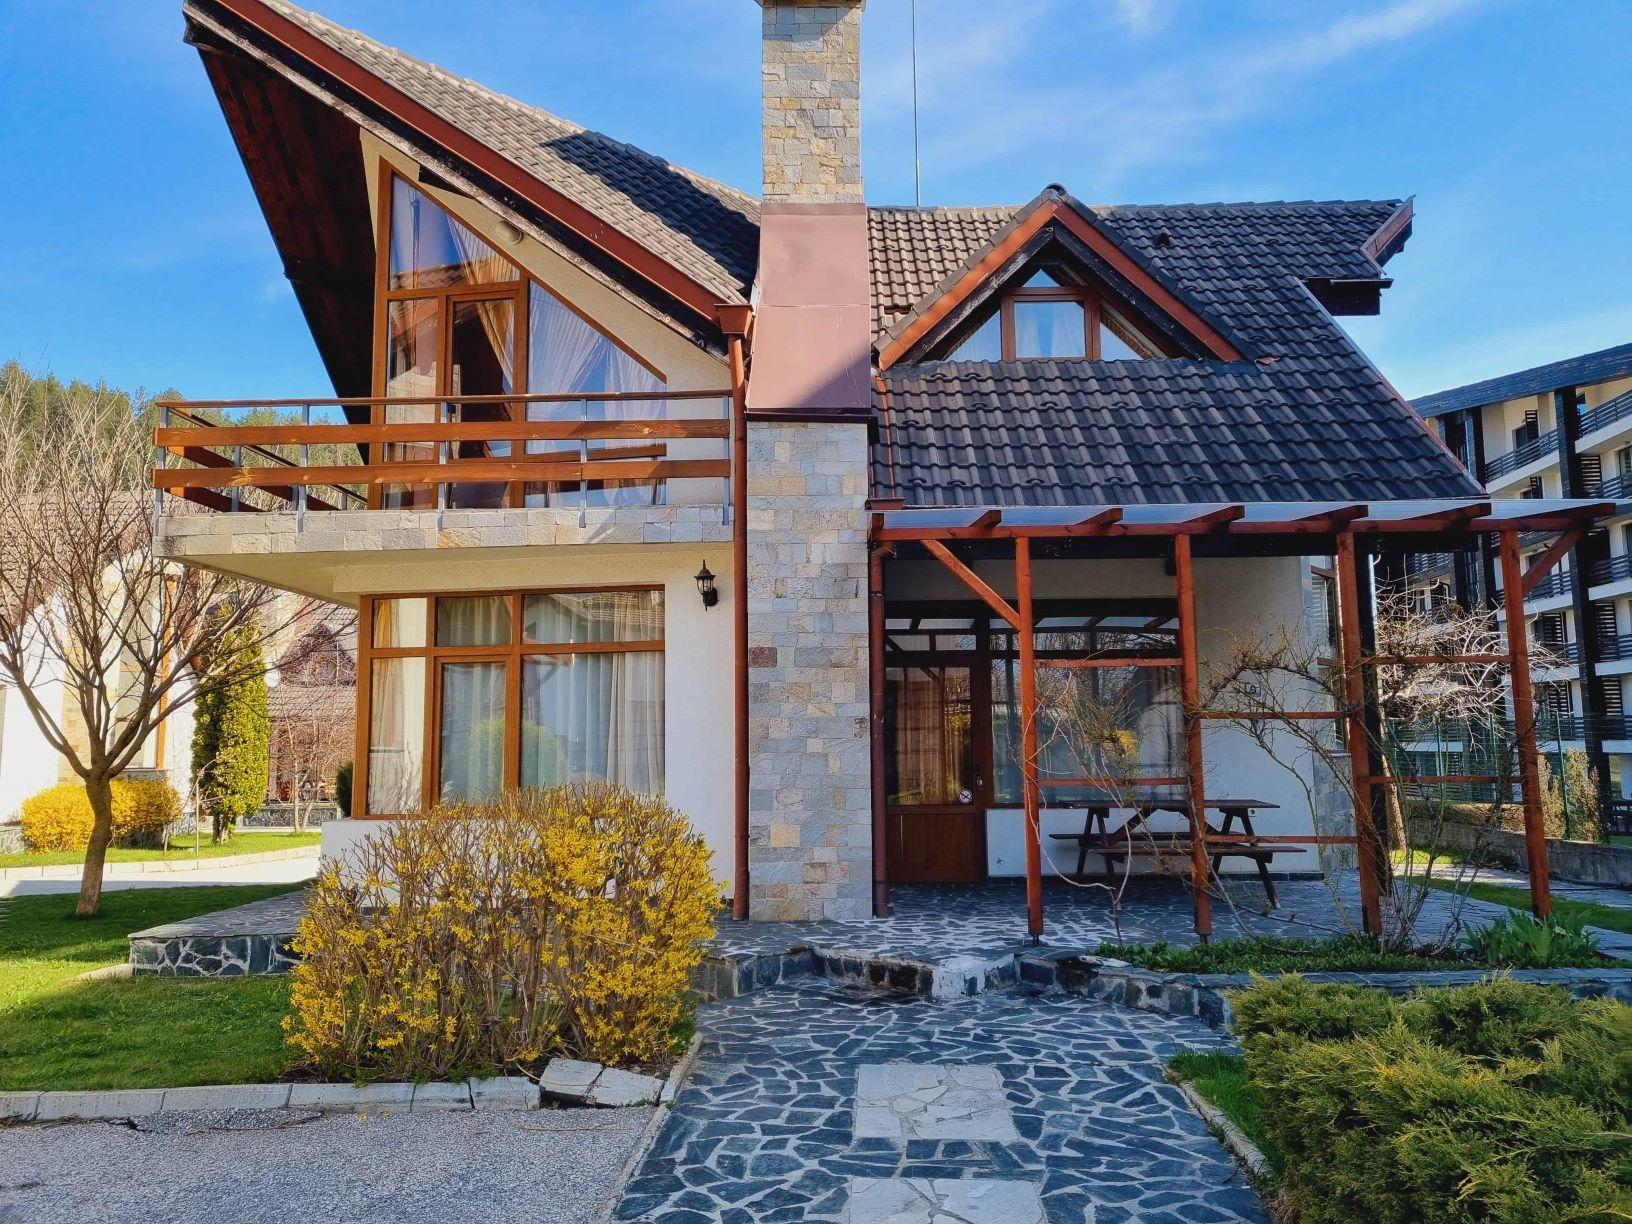 3 bedroom chalet for sale in Redenka Holiday Club near Bansko